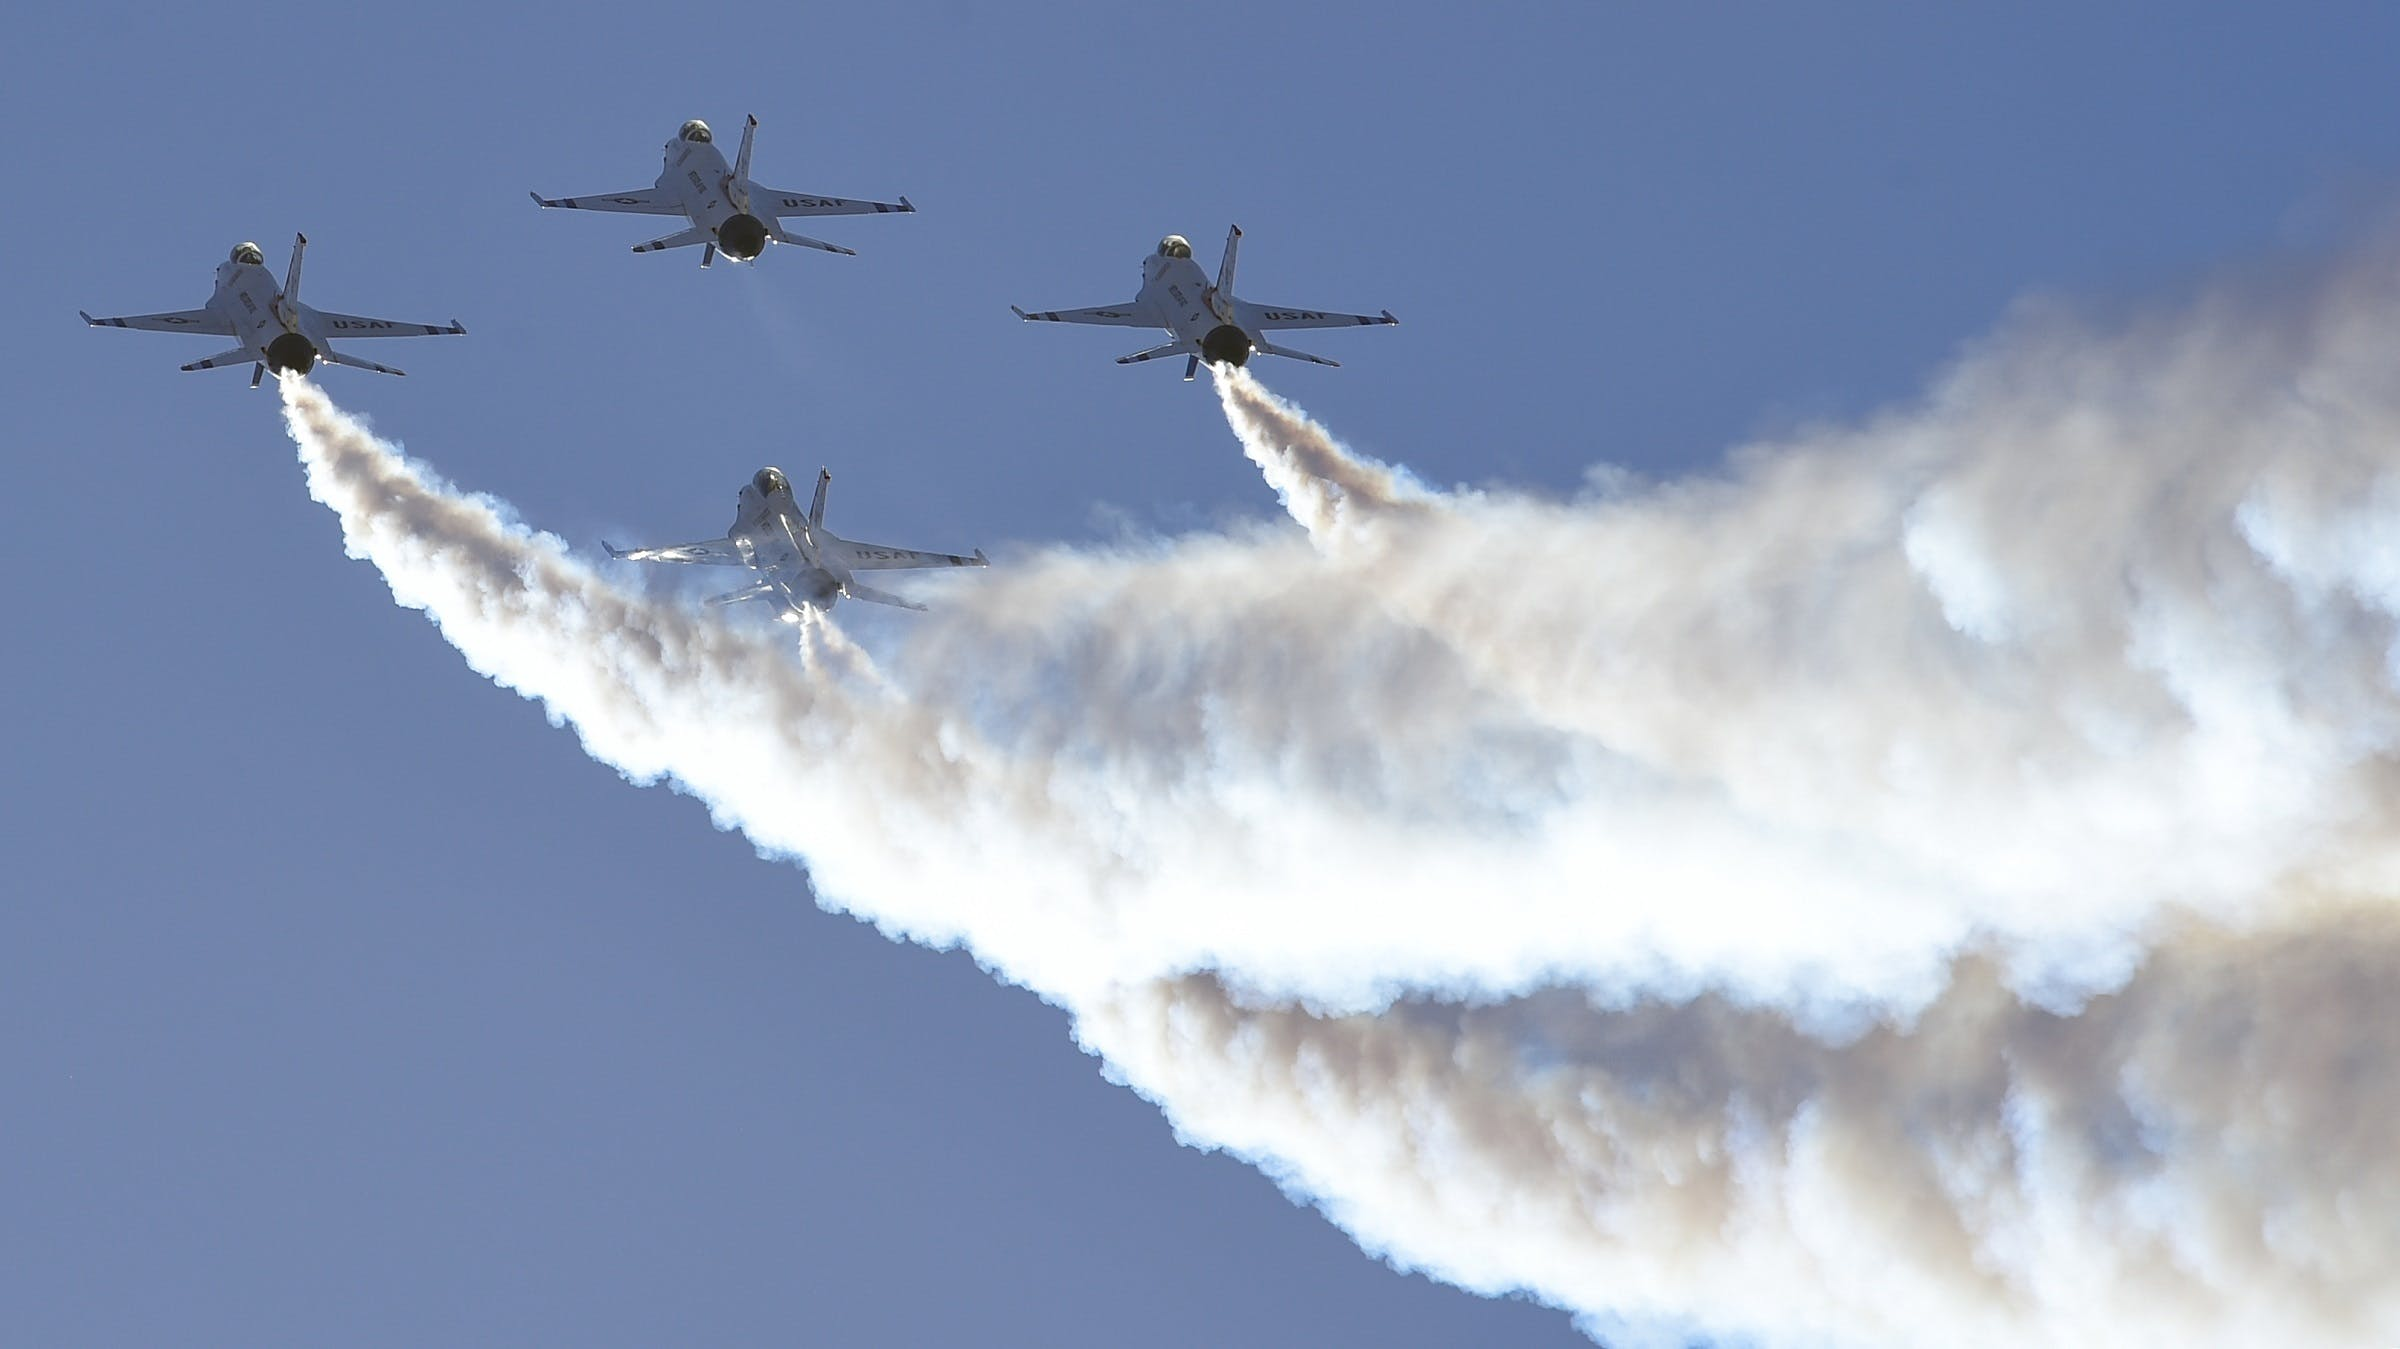 Free stock photo of plane, group, smoke, military